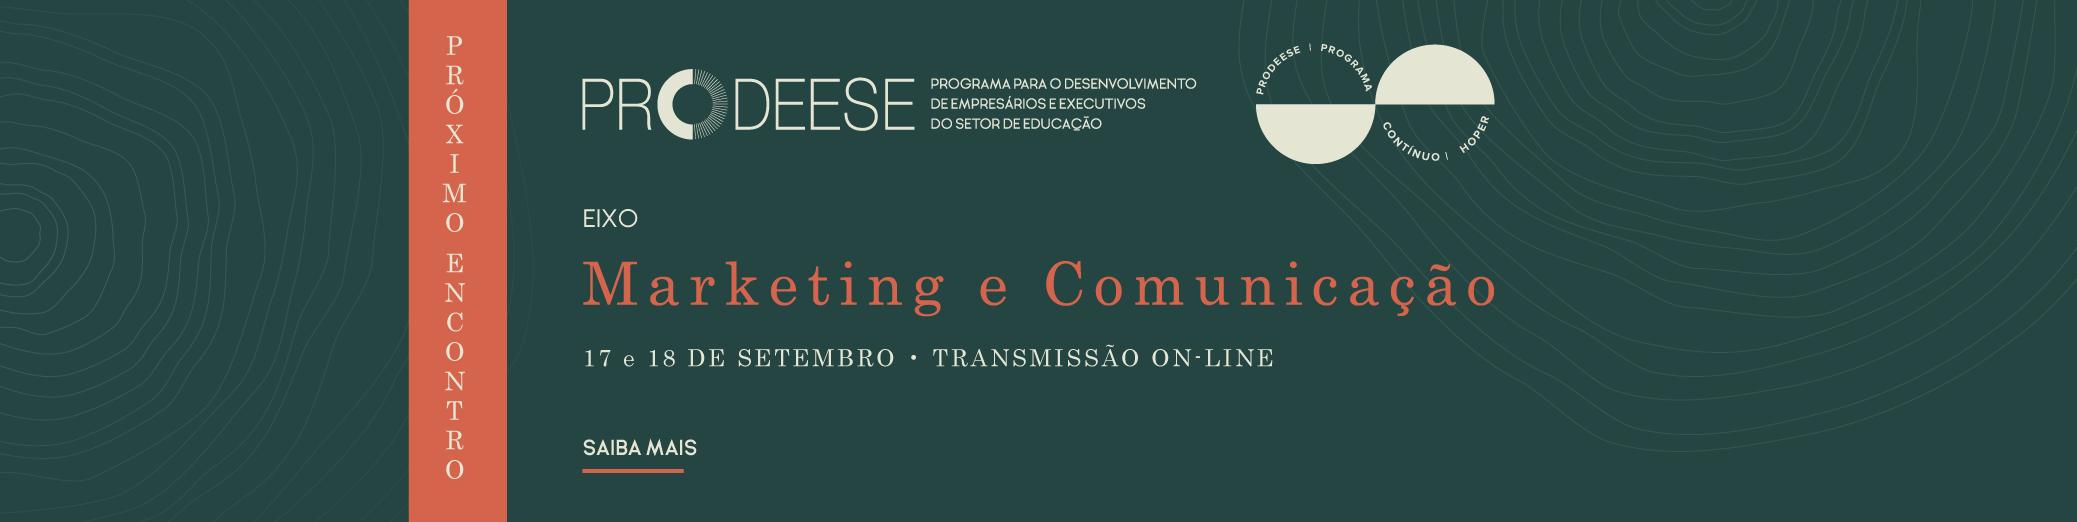 Banner_Prodeese_eixo_marketing_e_comunic